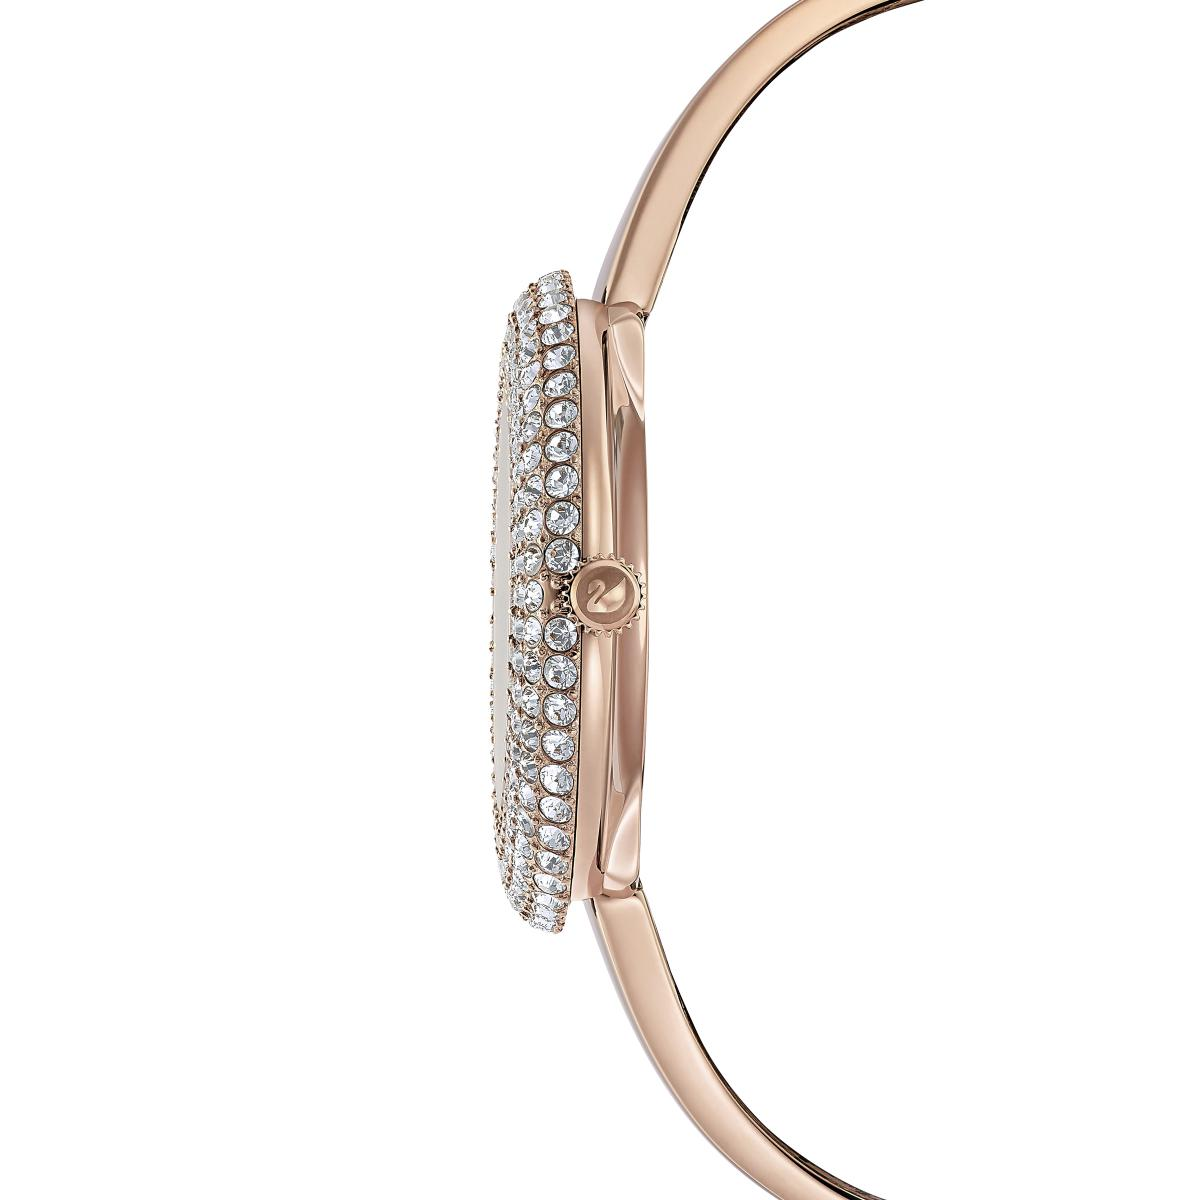 Montre Swarovski 5484073 - Crystal Rose Bracelet Jonc Acier Doré Rose  Lunette Sertie En Micro-Pavé Femme